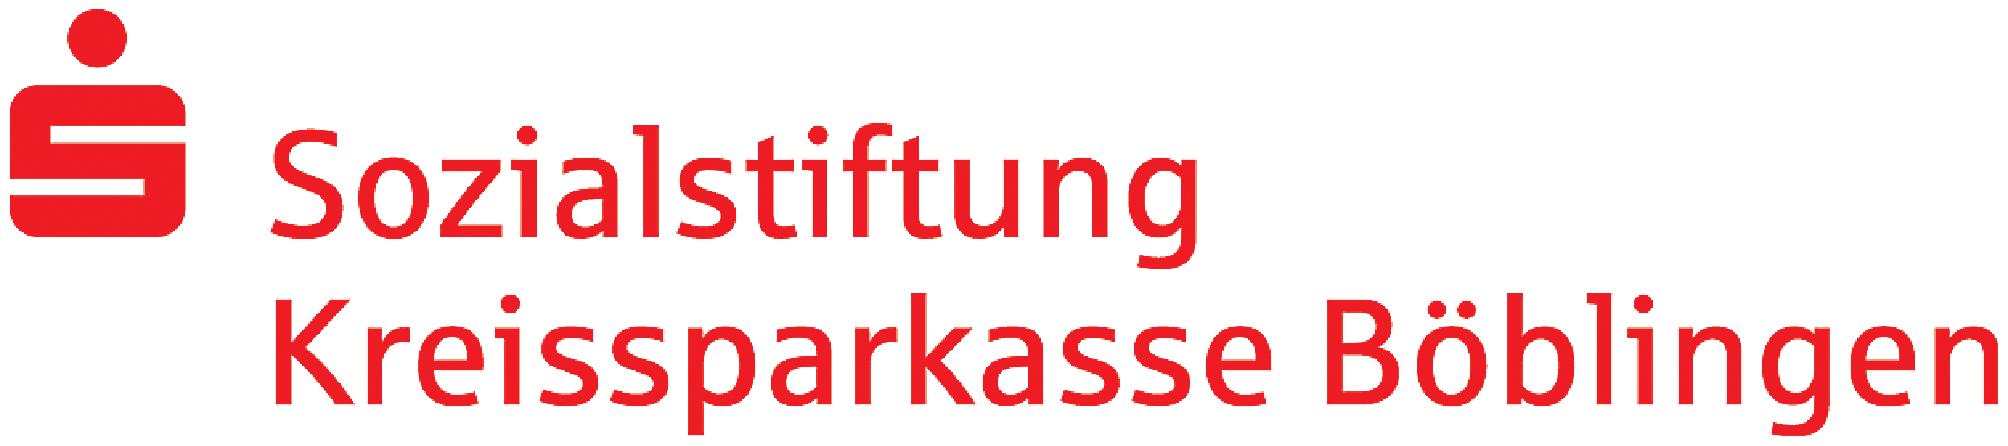 SozialStifung_Kreissparkasse